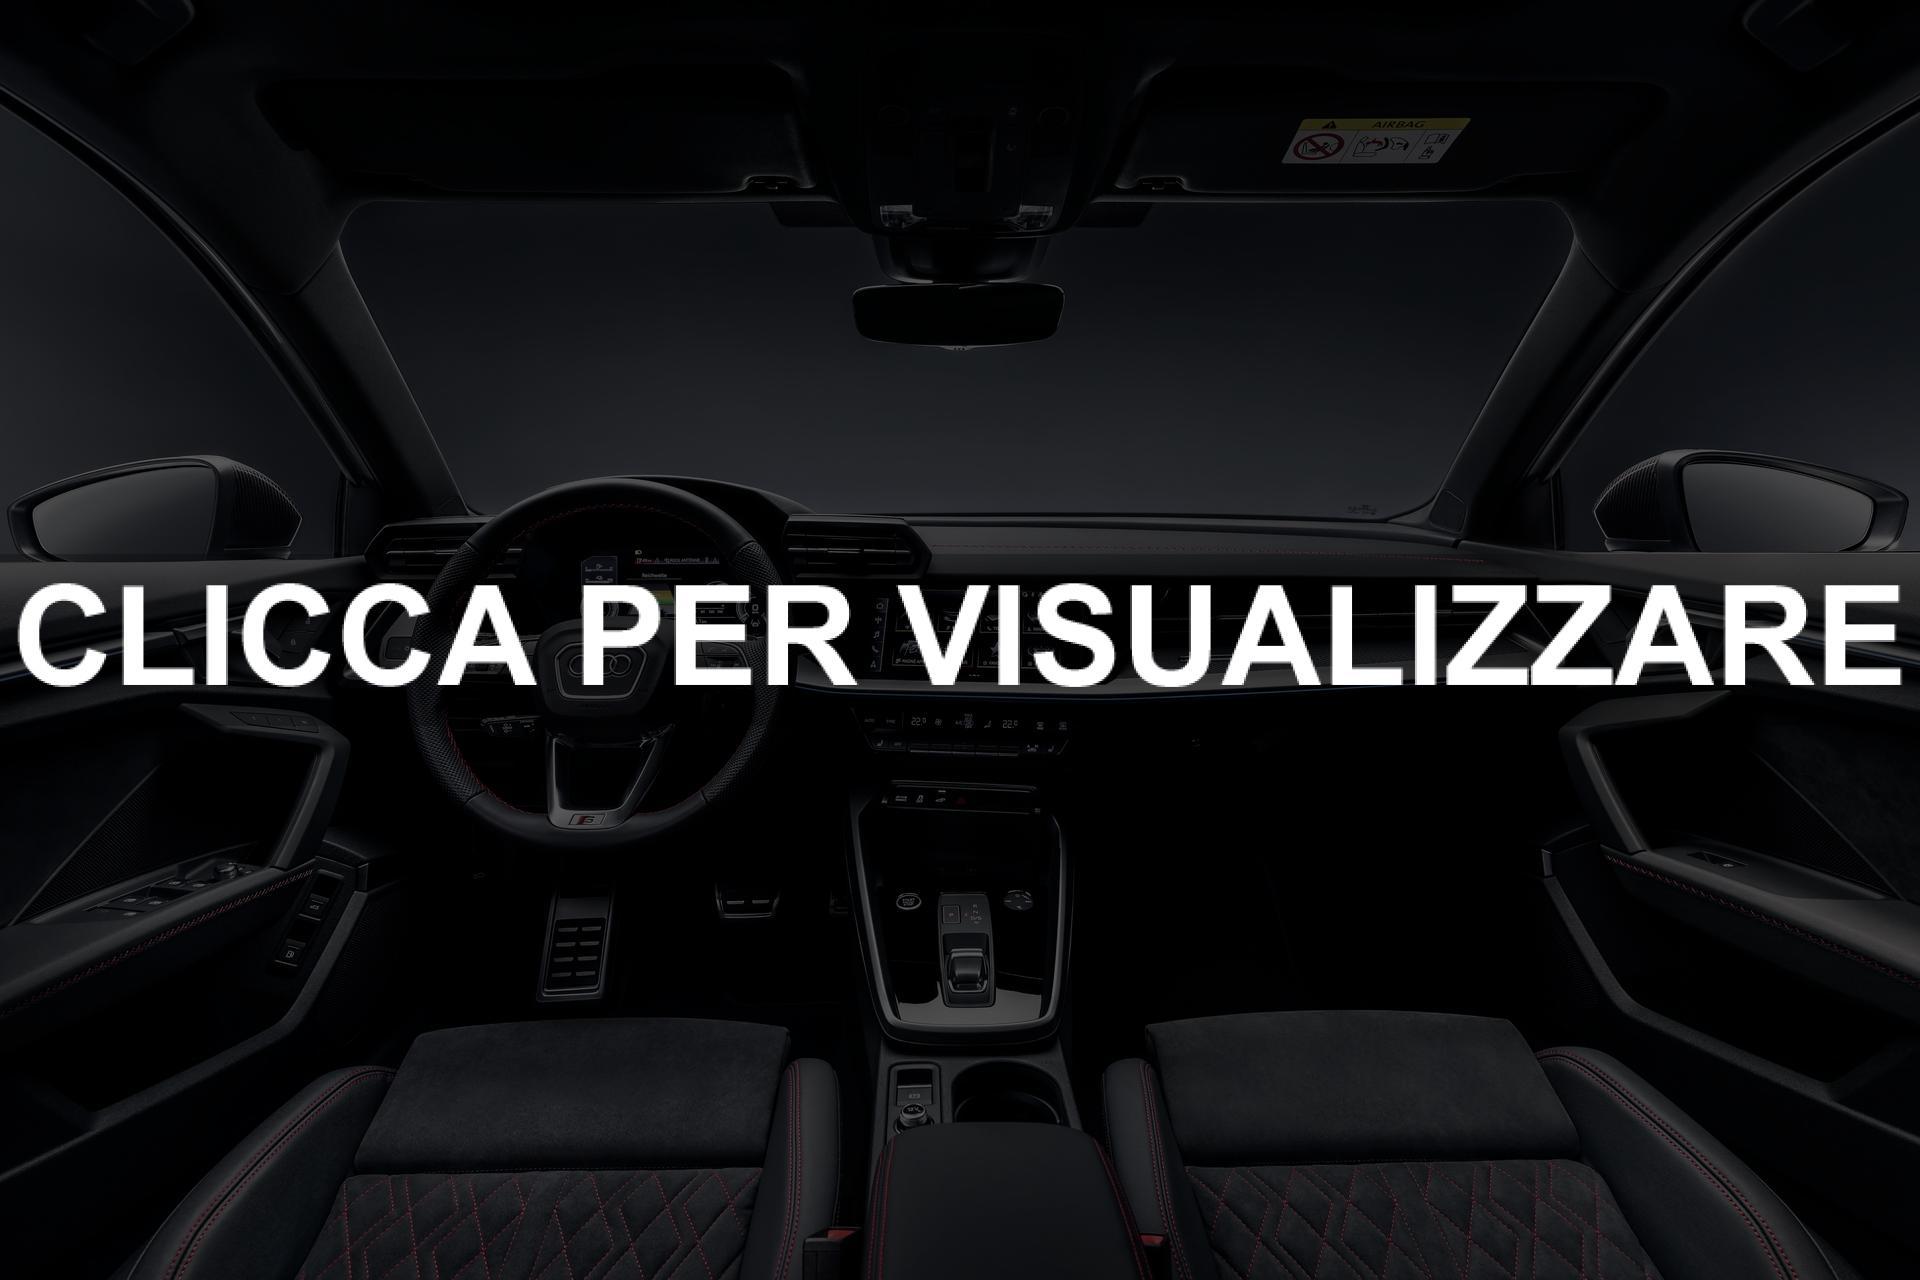 Immagine interni nuova Audi A3 Sportback 45 TFSI Ibrida plug in 2021